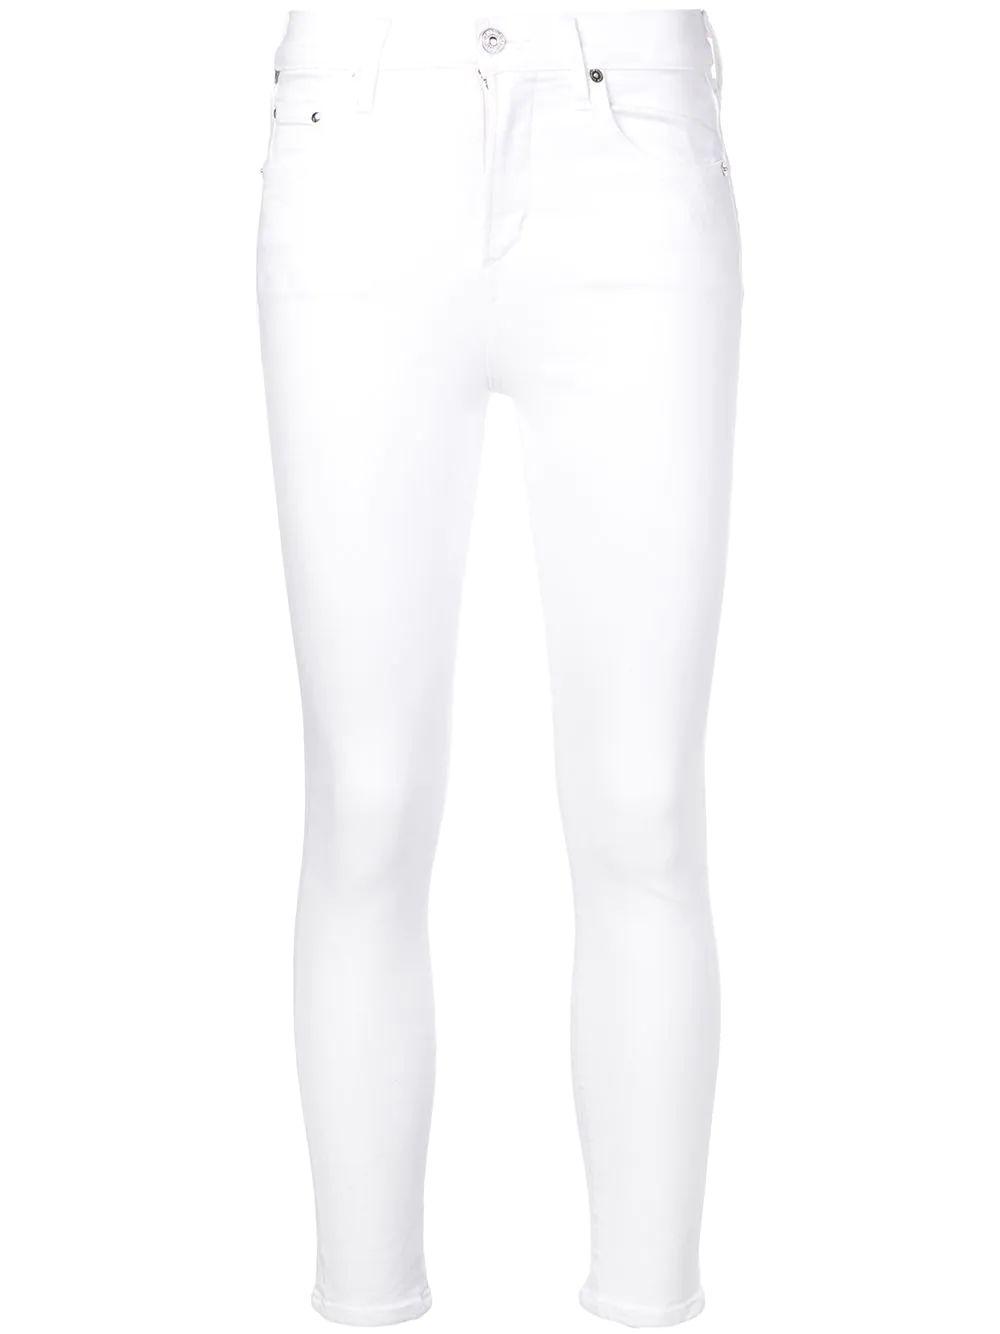 Rocket High Rise Cropped Skinny Jean Item # 1487-1106-S21